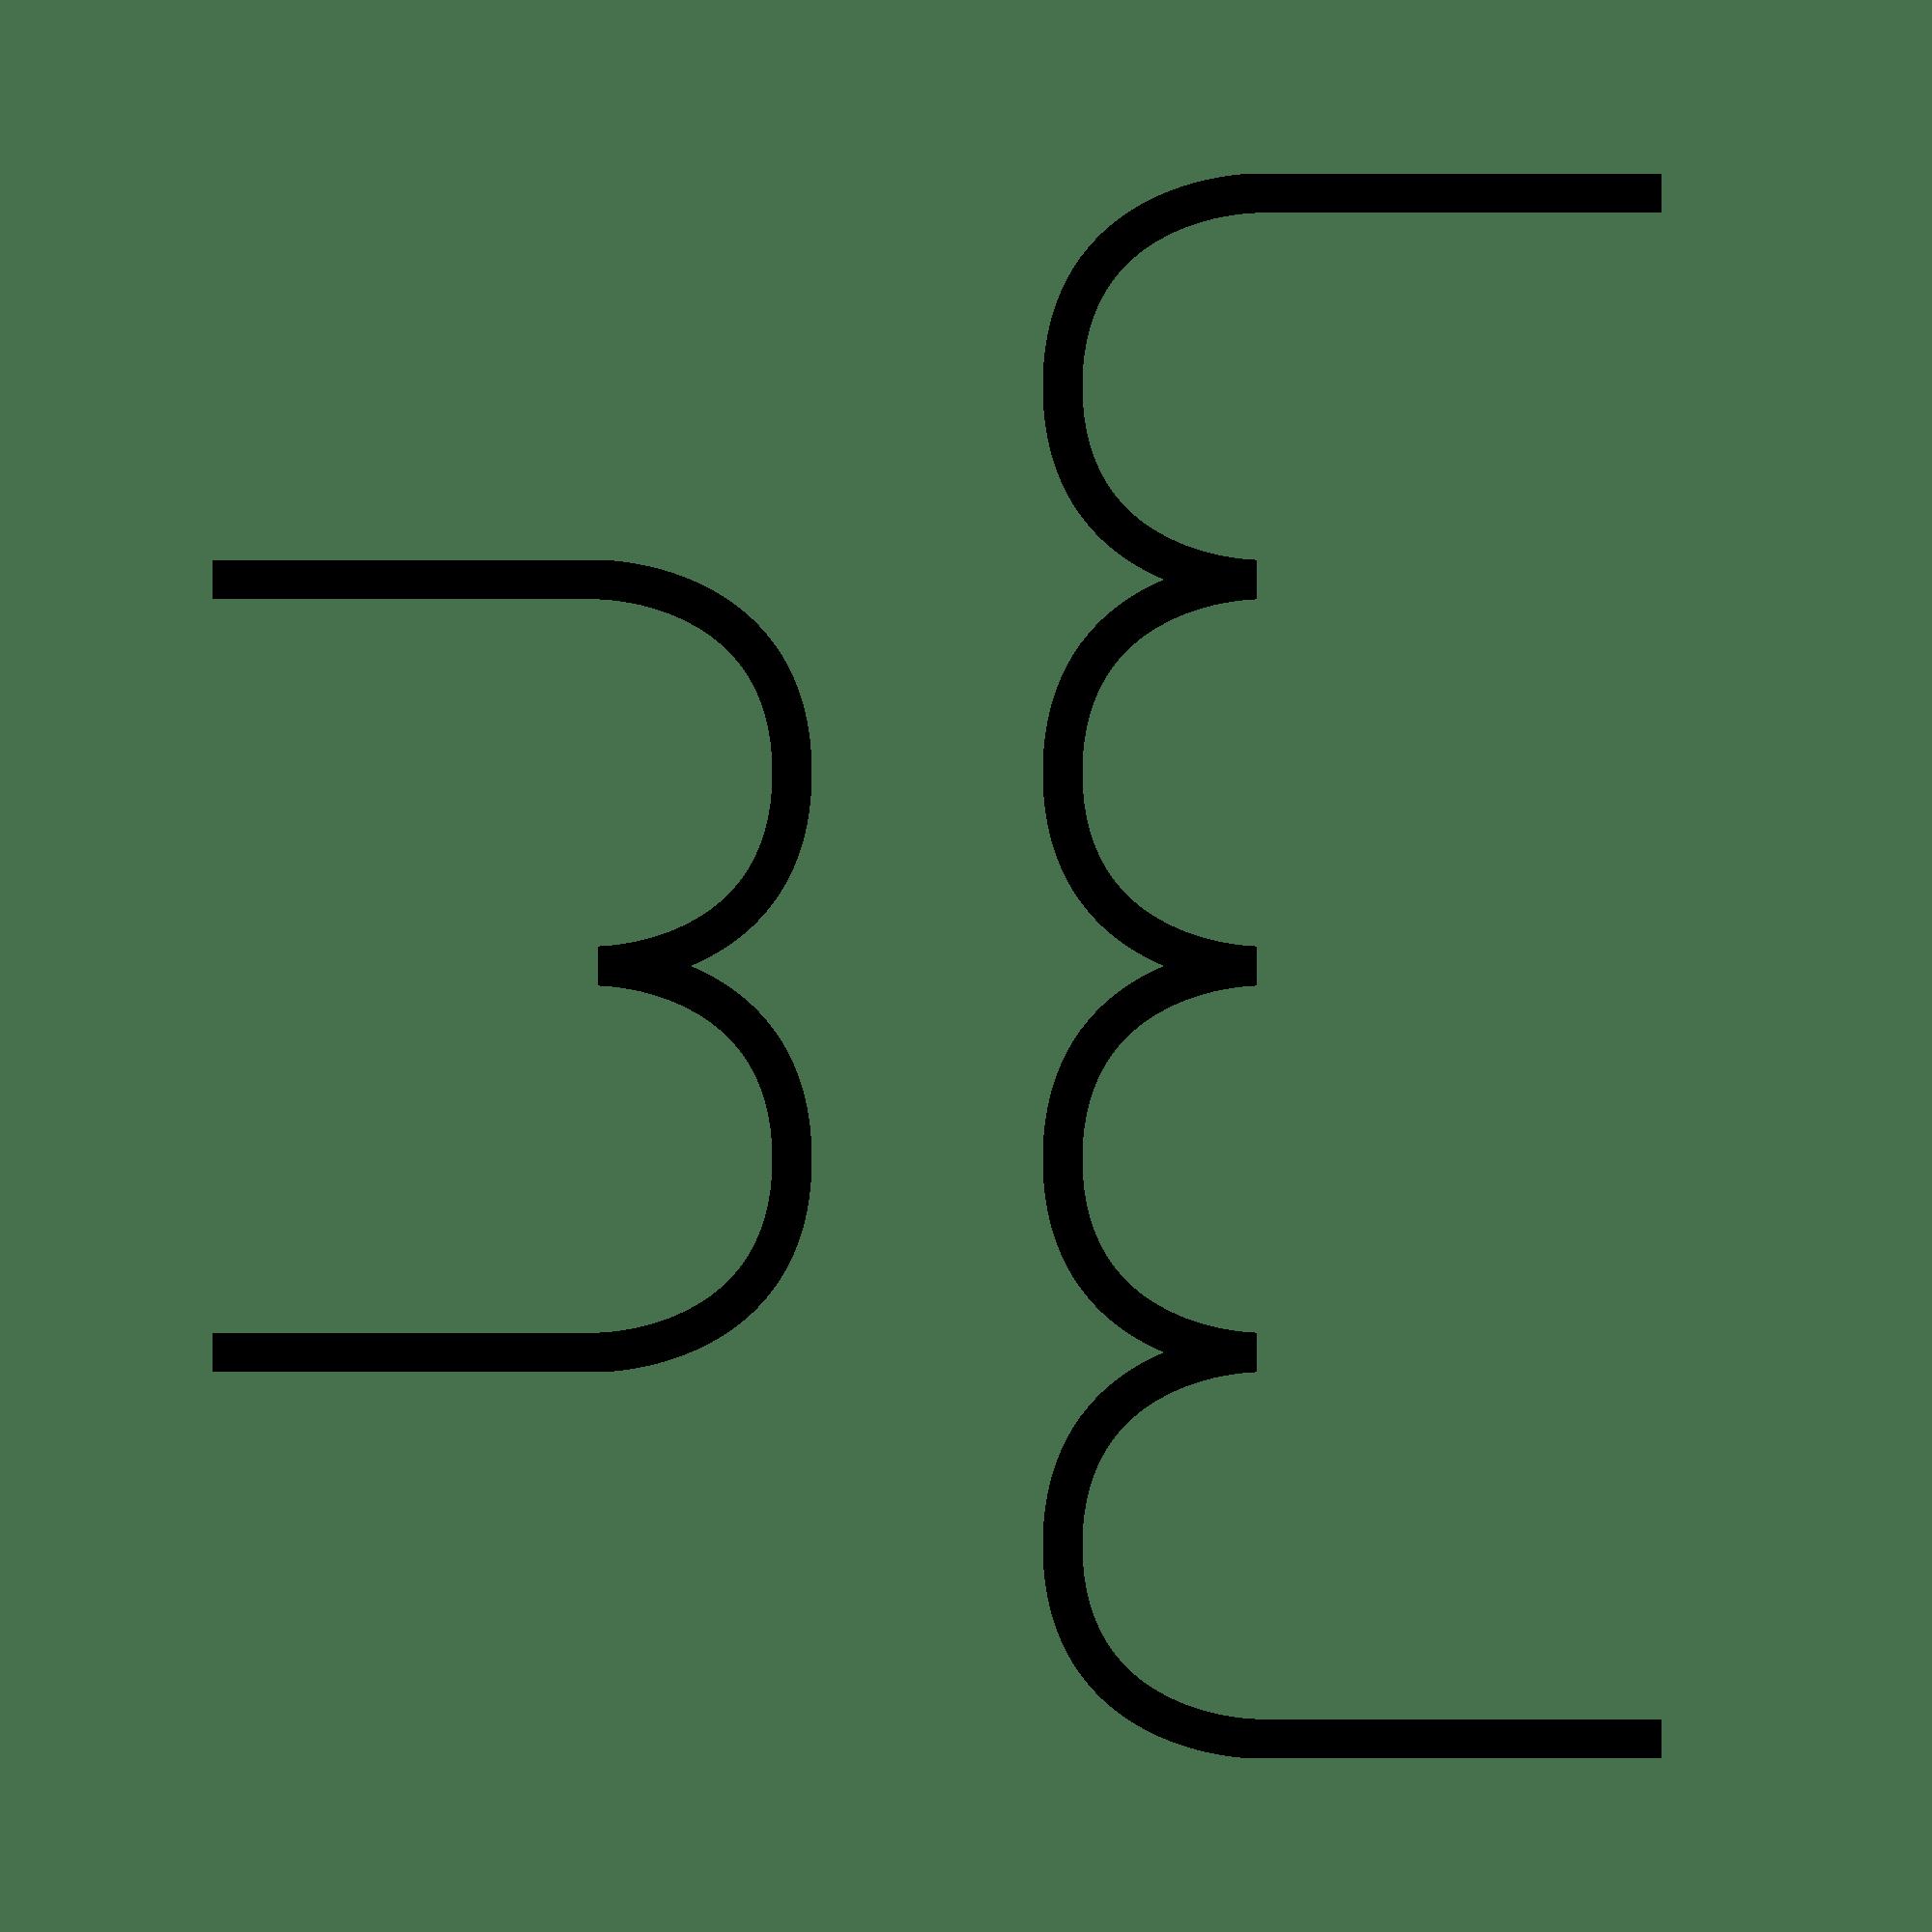 Transformer Electrical Symbol